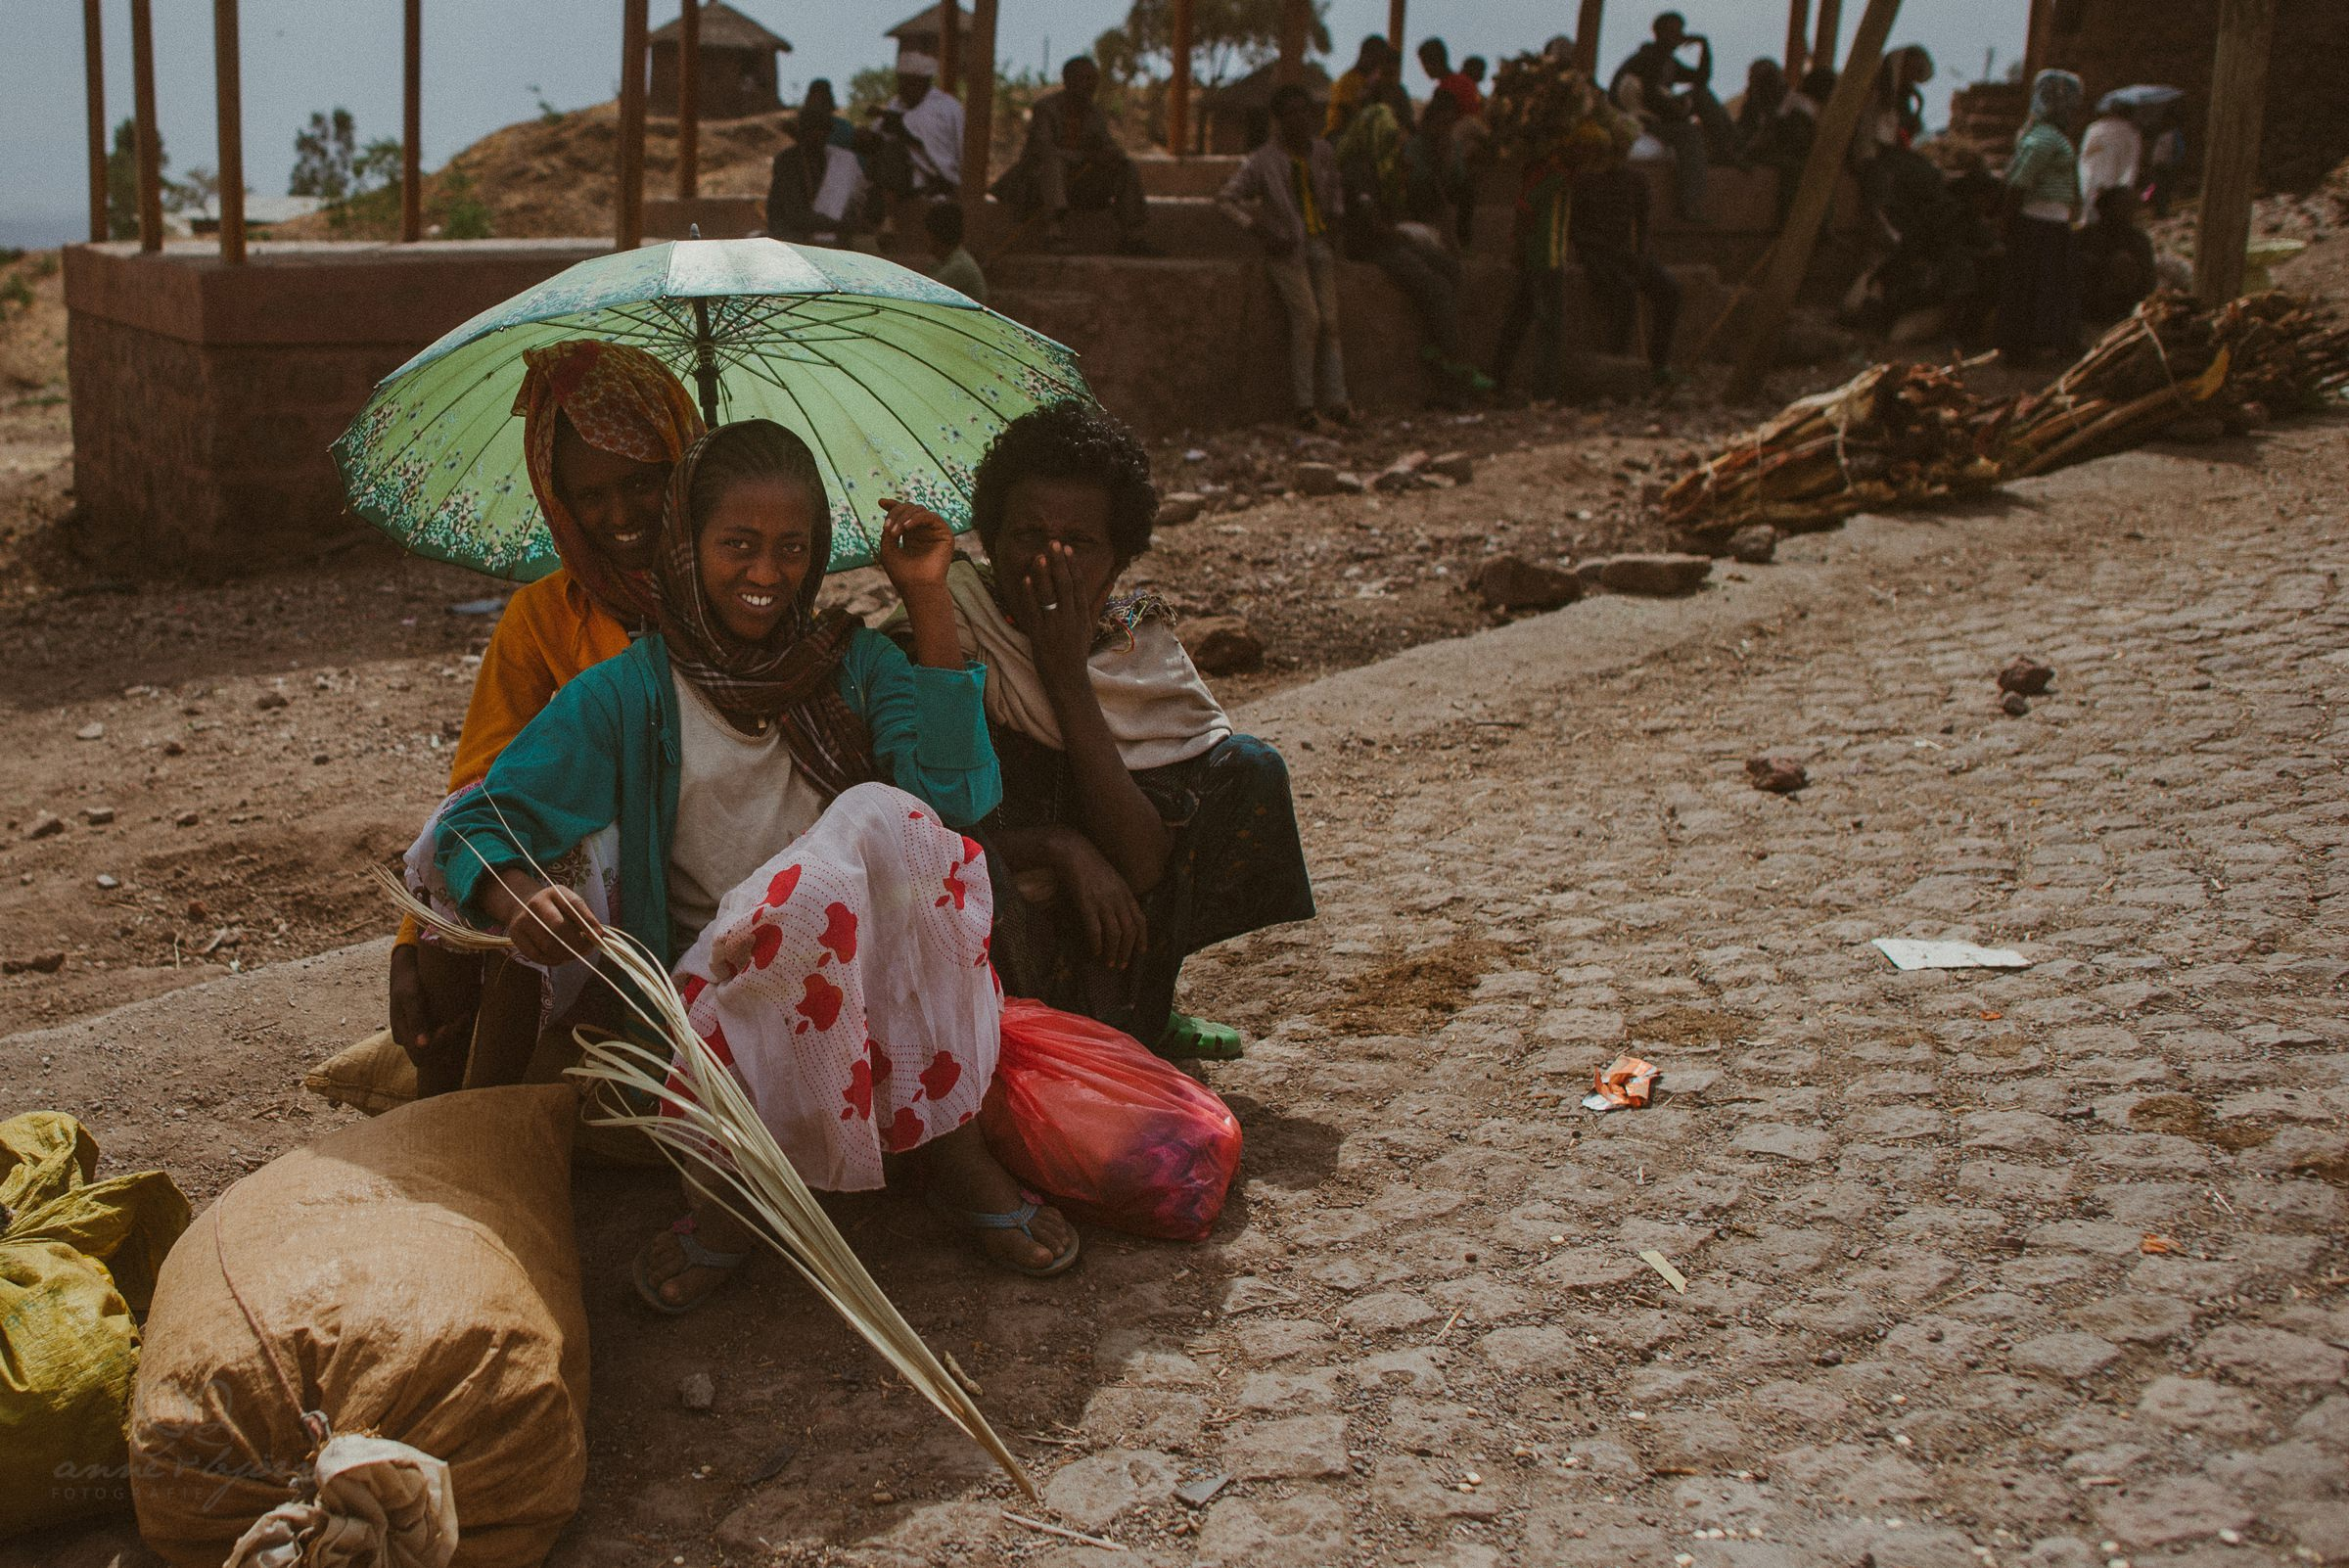 Regenschirm, Afrika, Straße, Reisen, Travel, Streetphotography